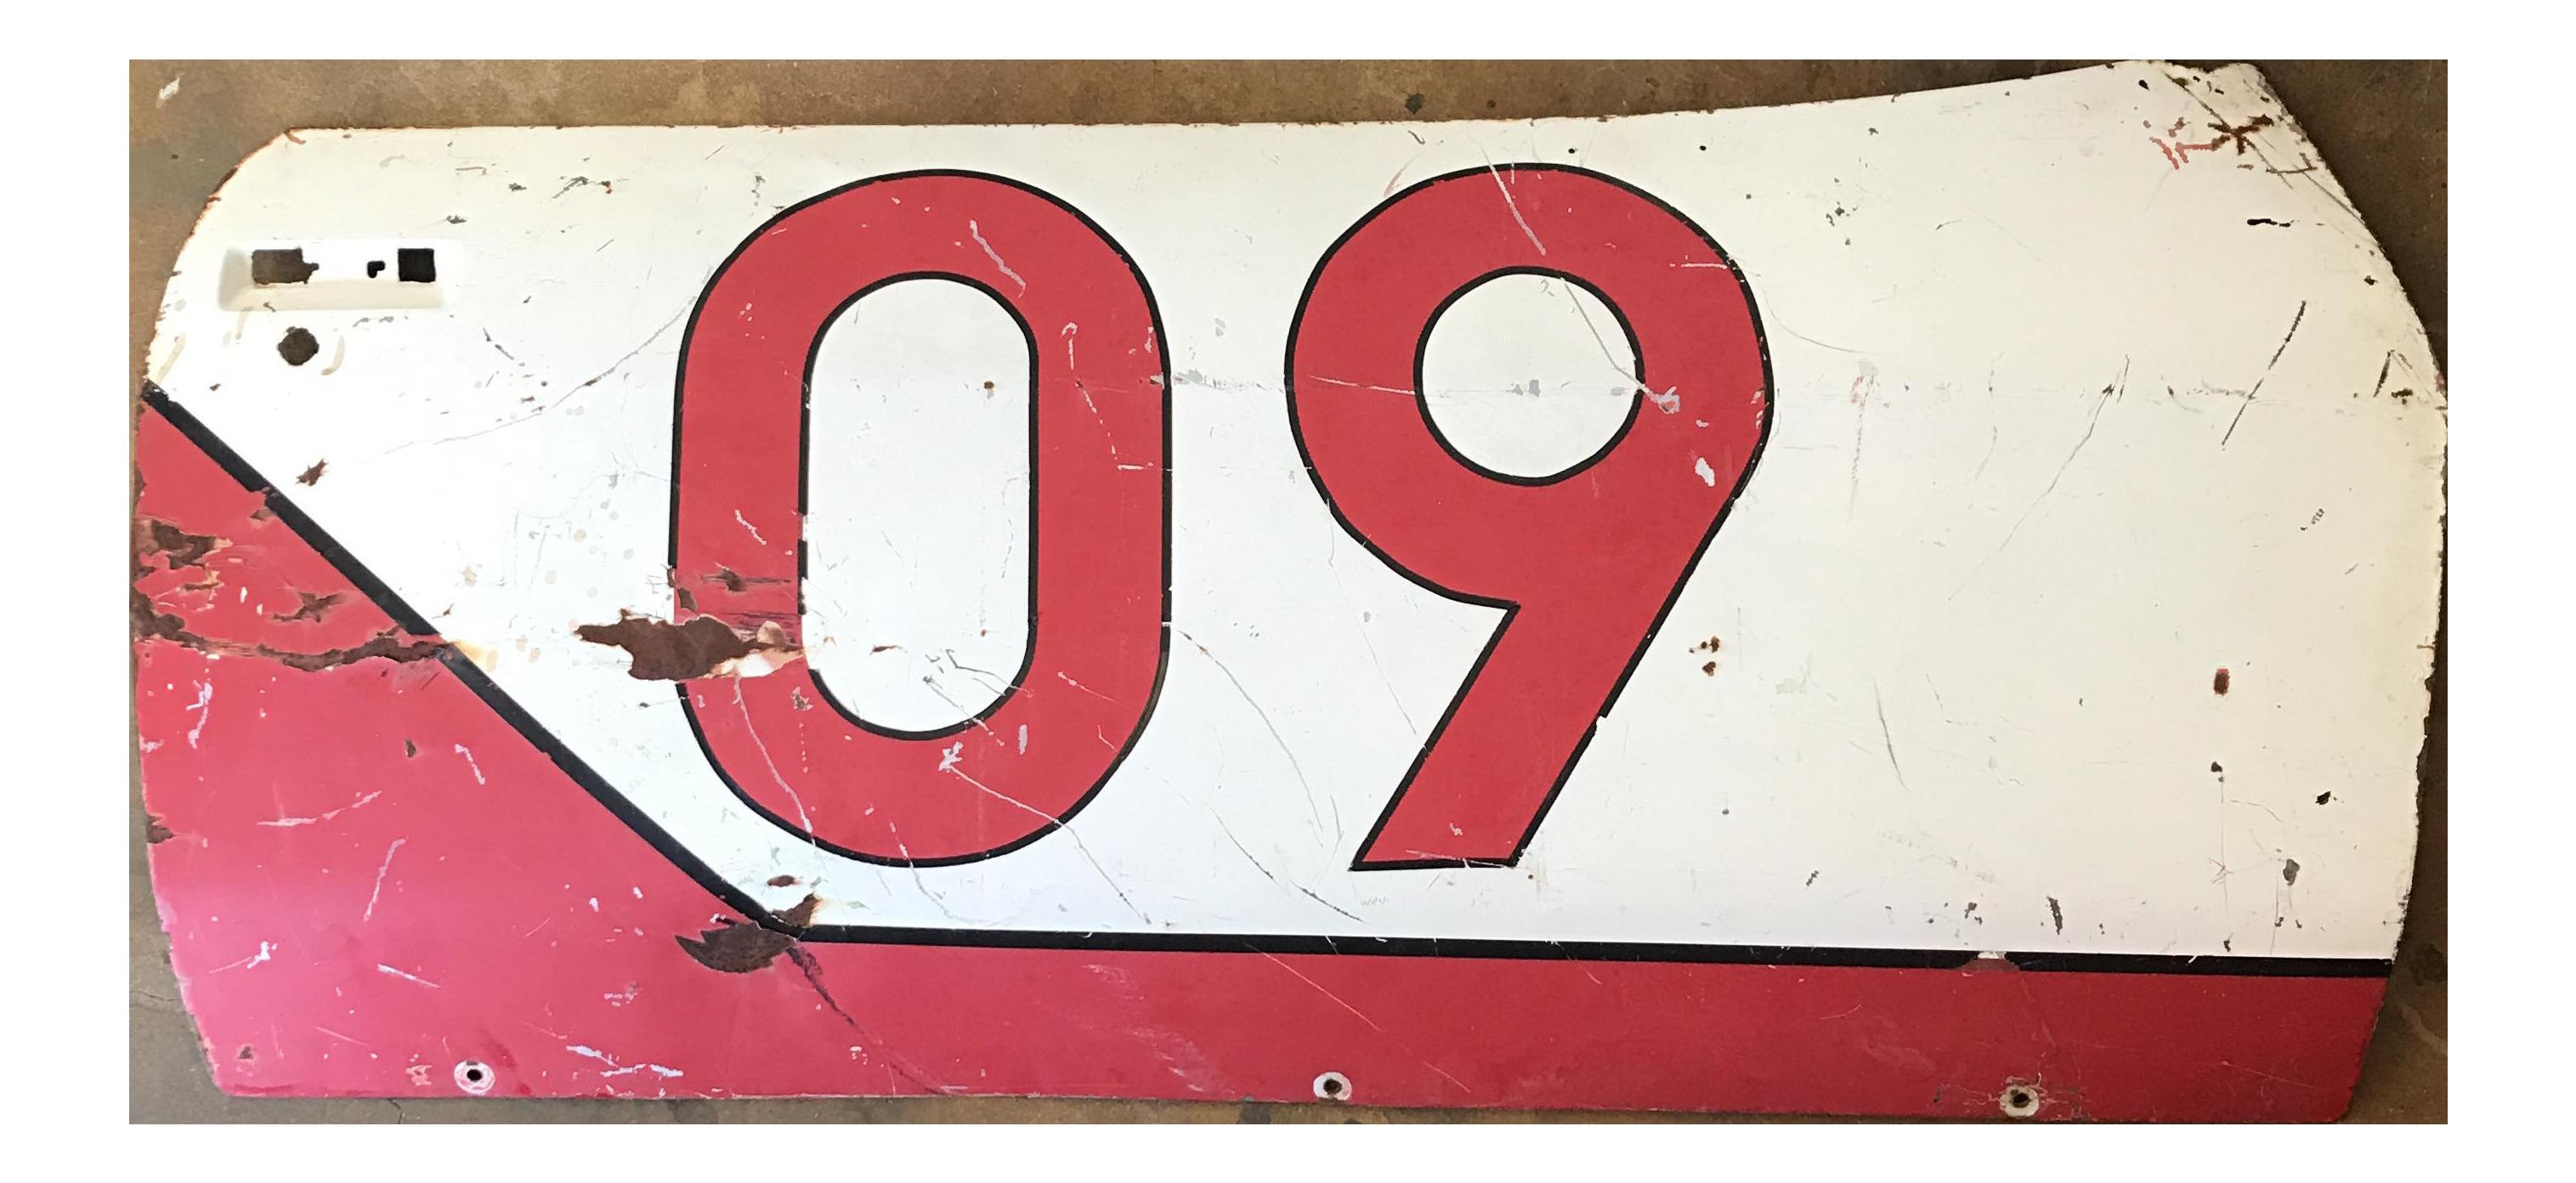 Door clipart rectangular object. Graphic race car panel